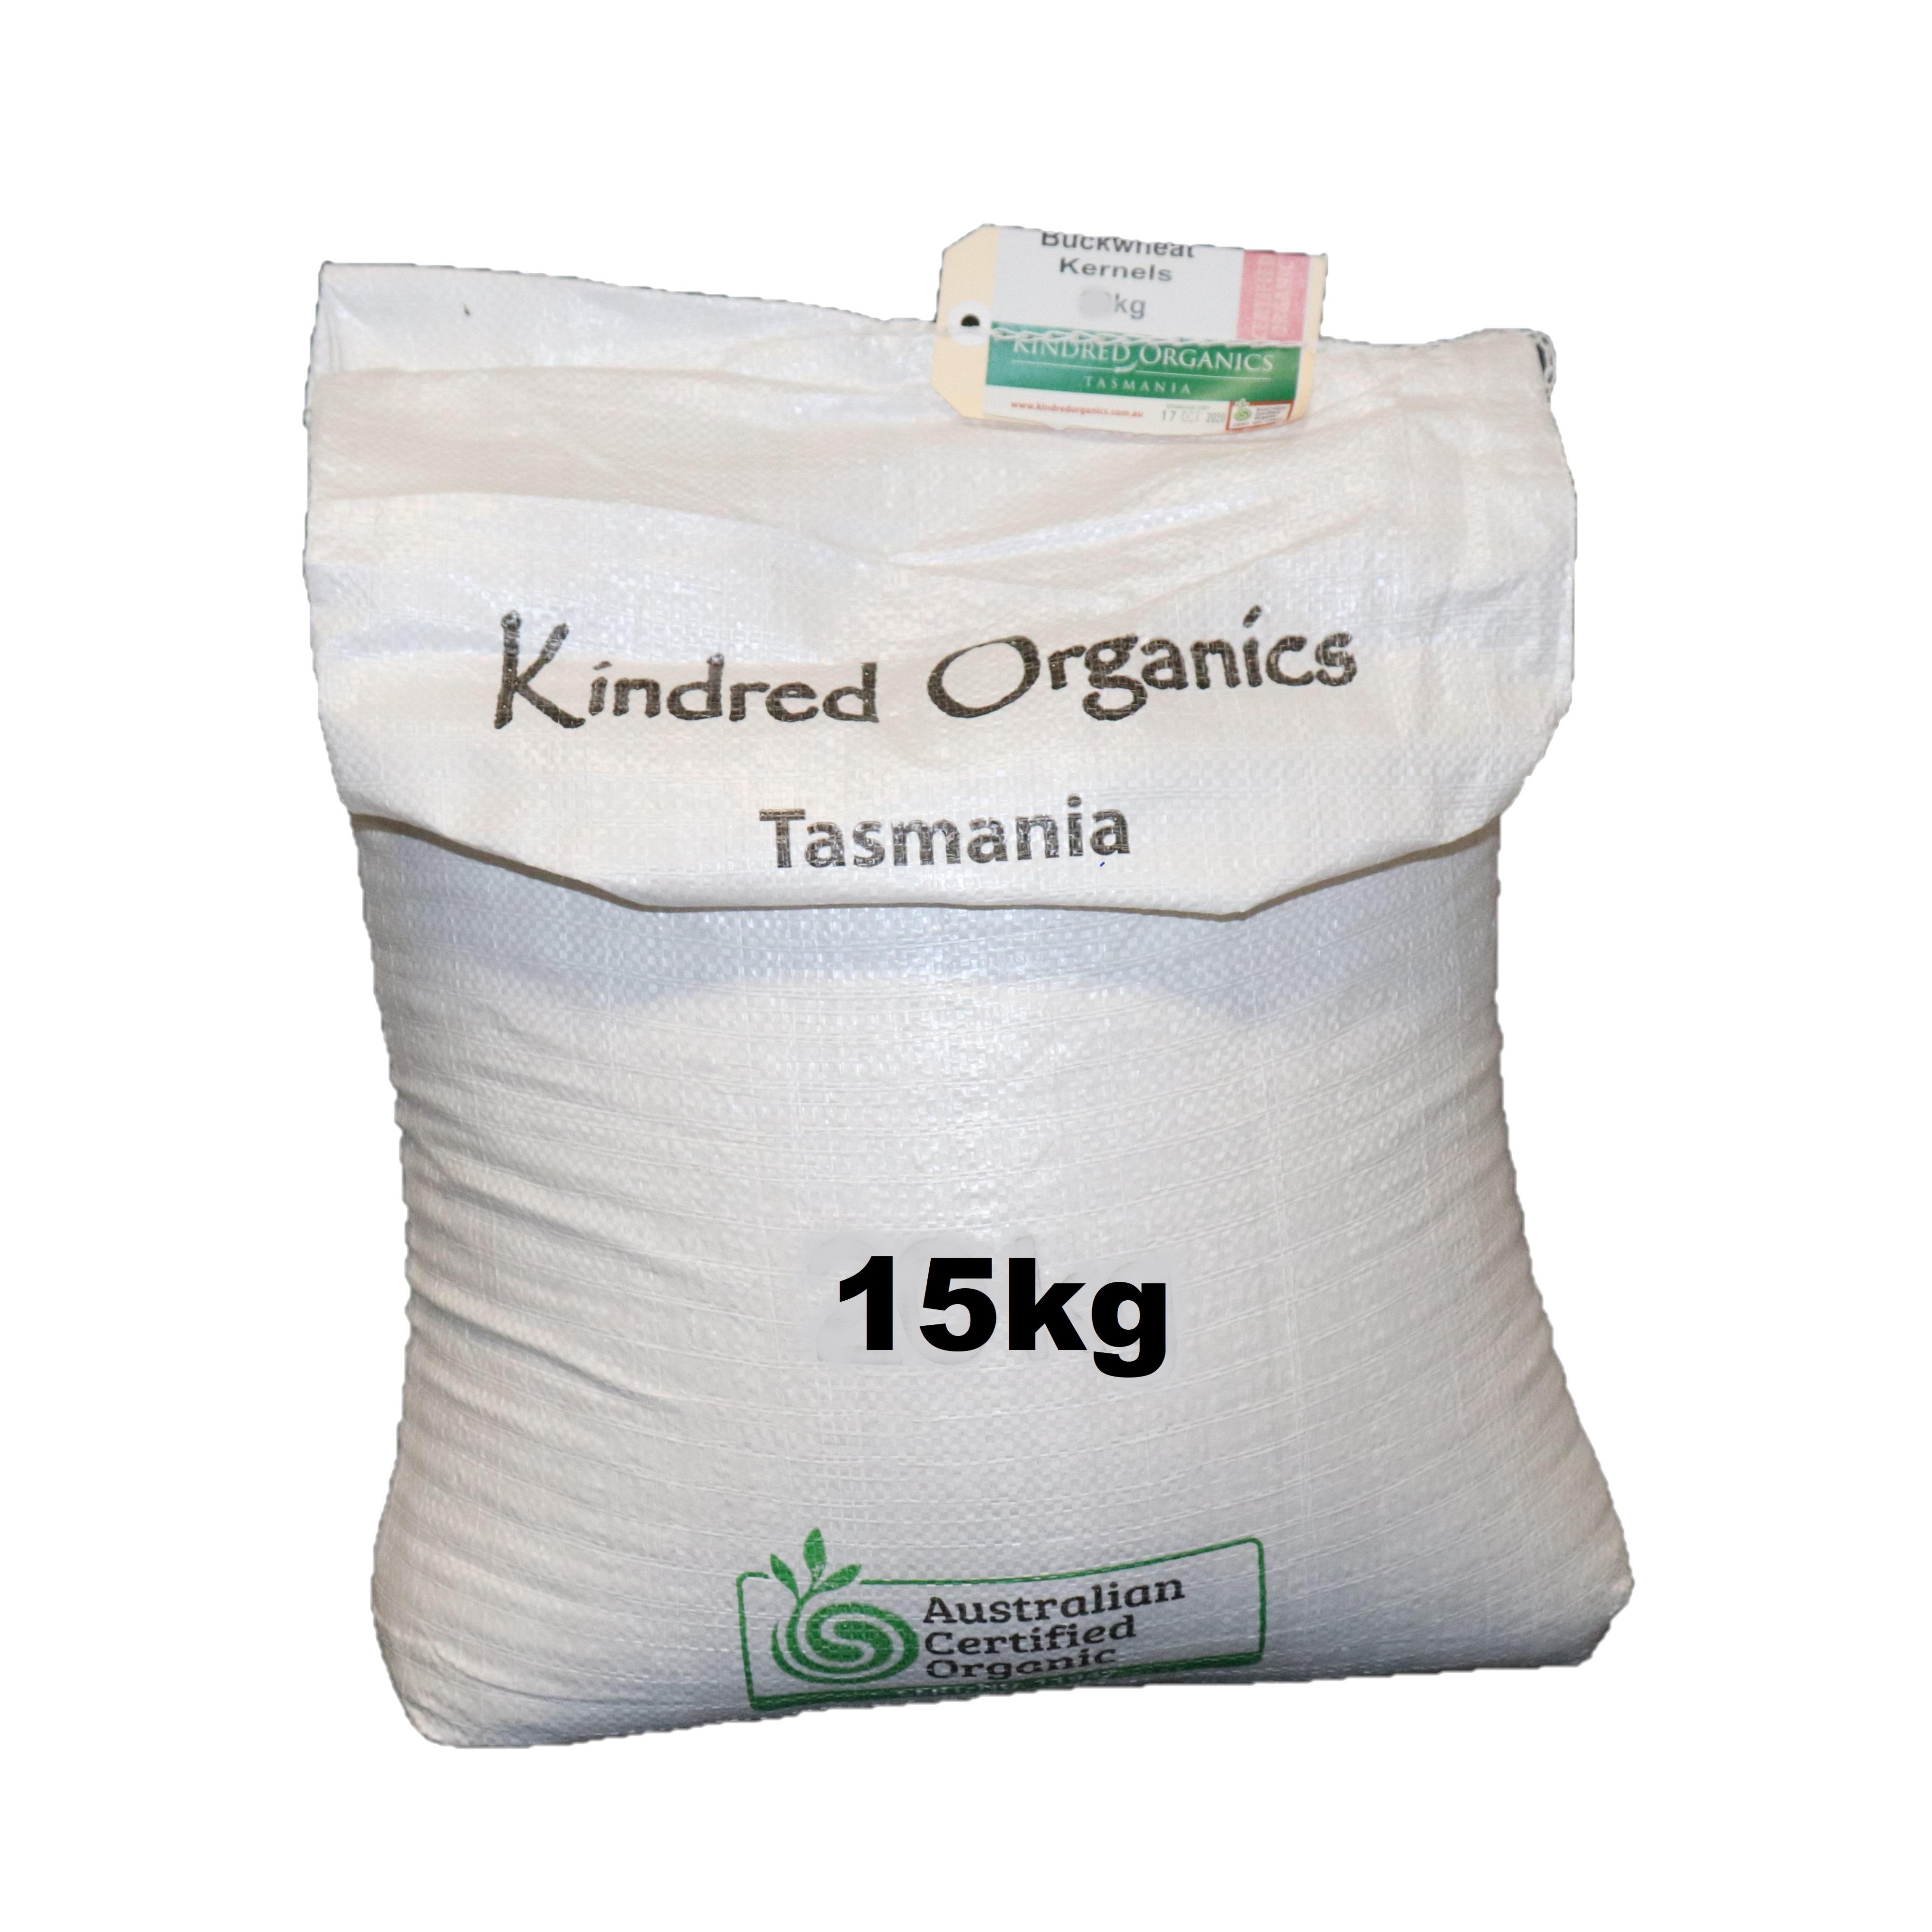 Kindred Organics